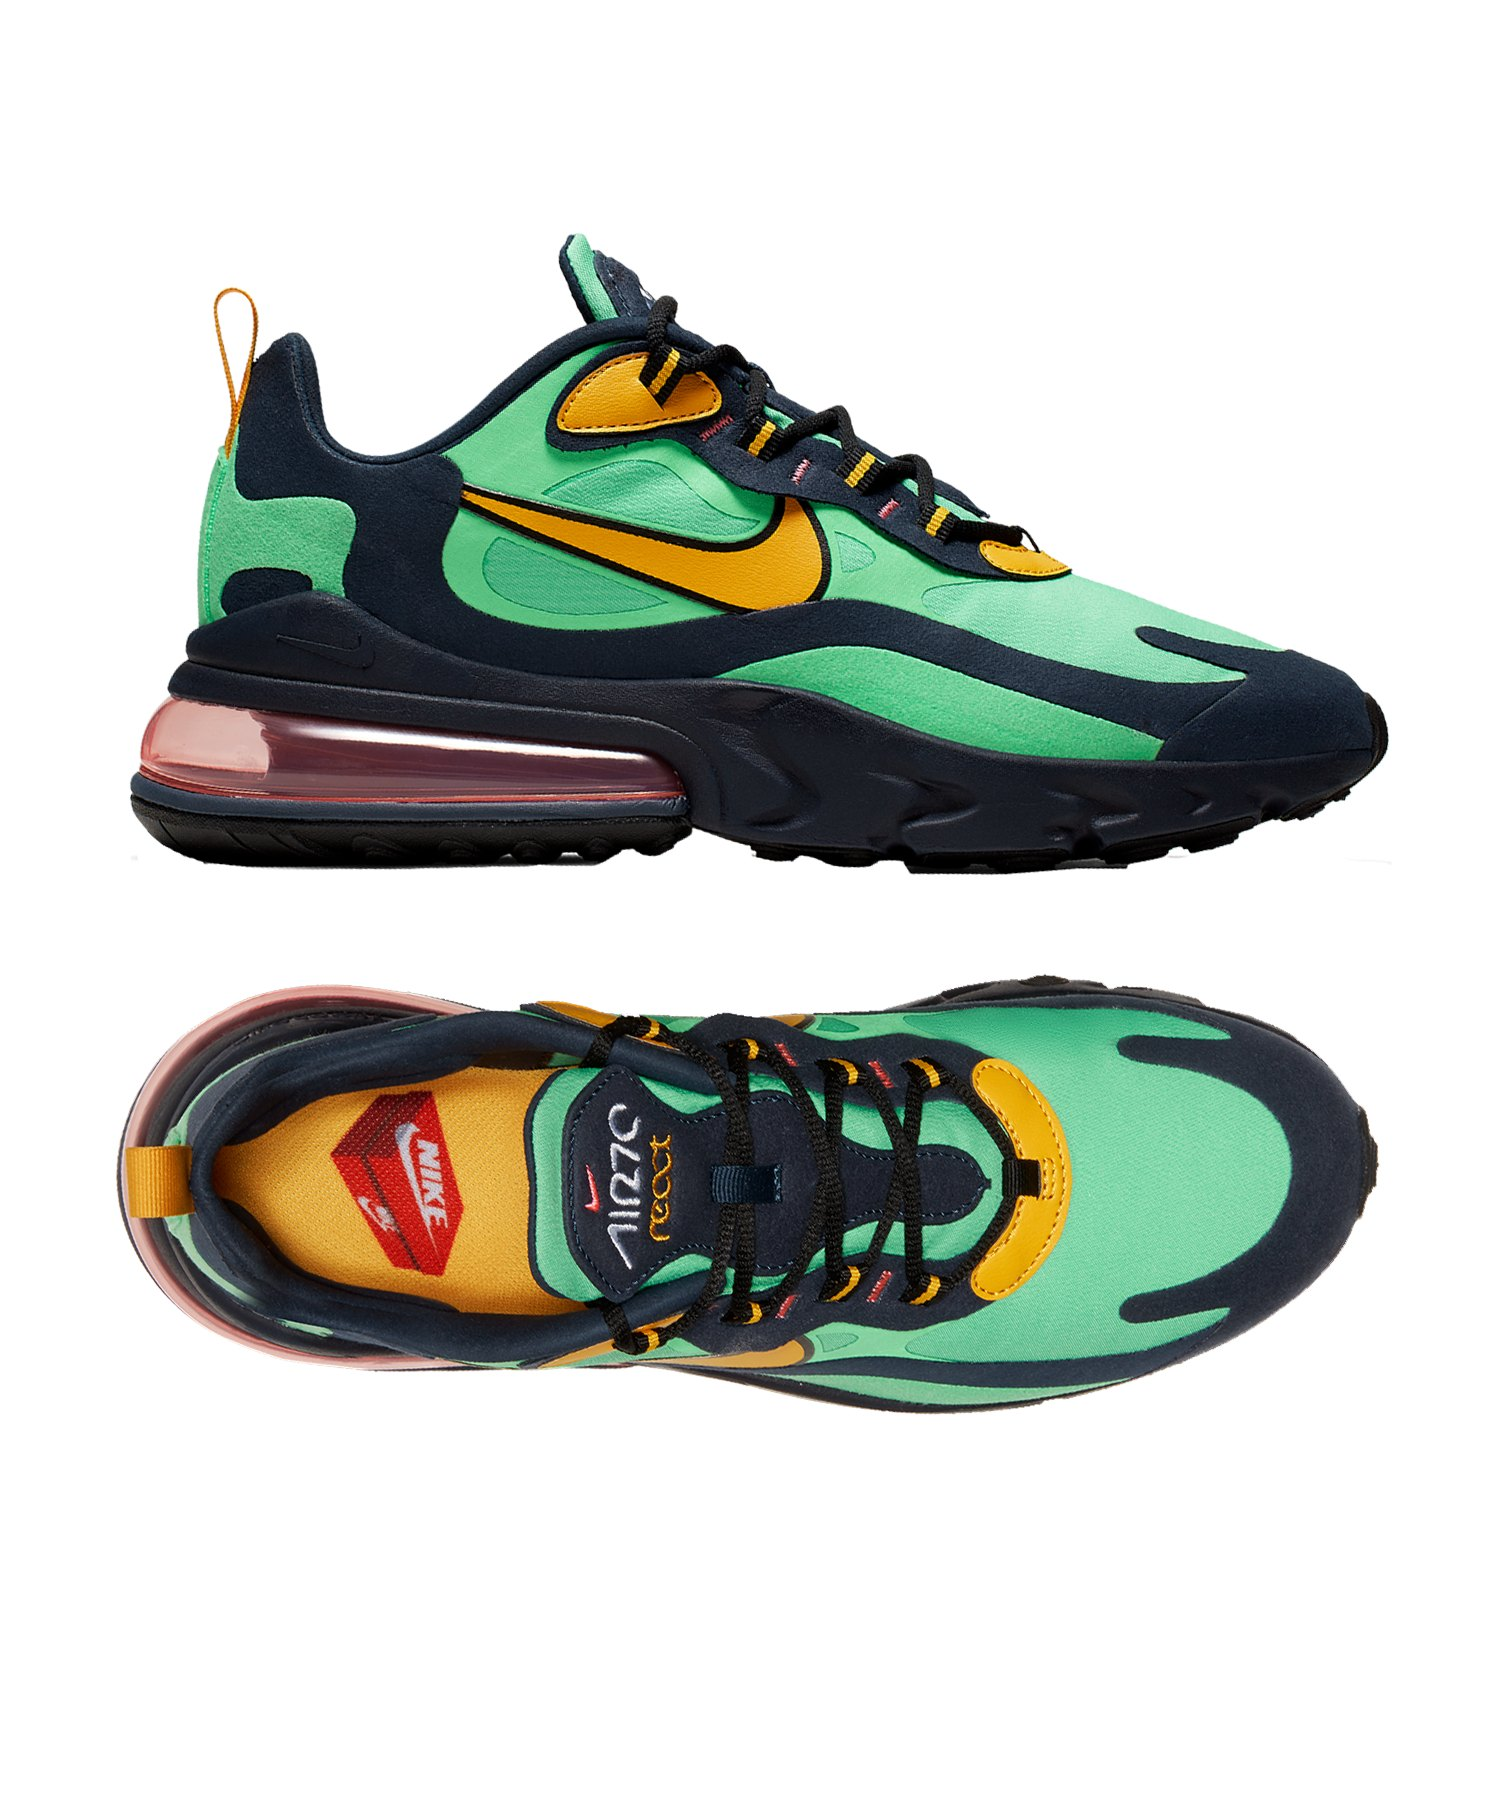 Puma Sneaker 40,5 grün